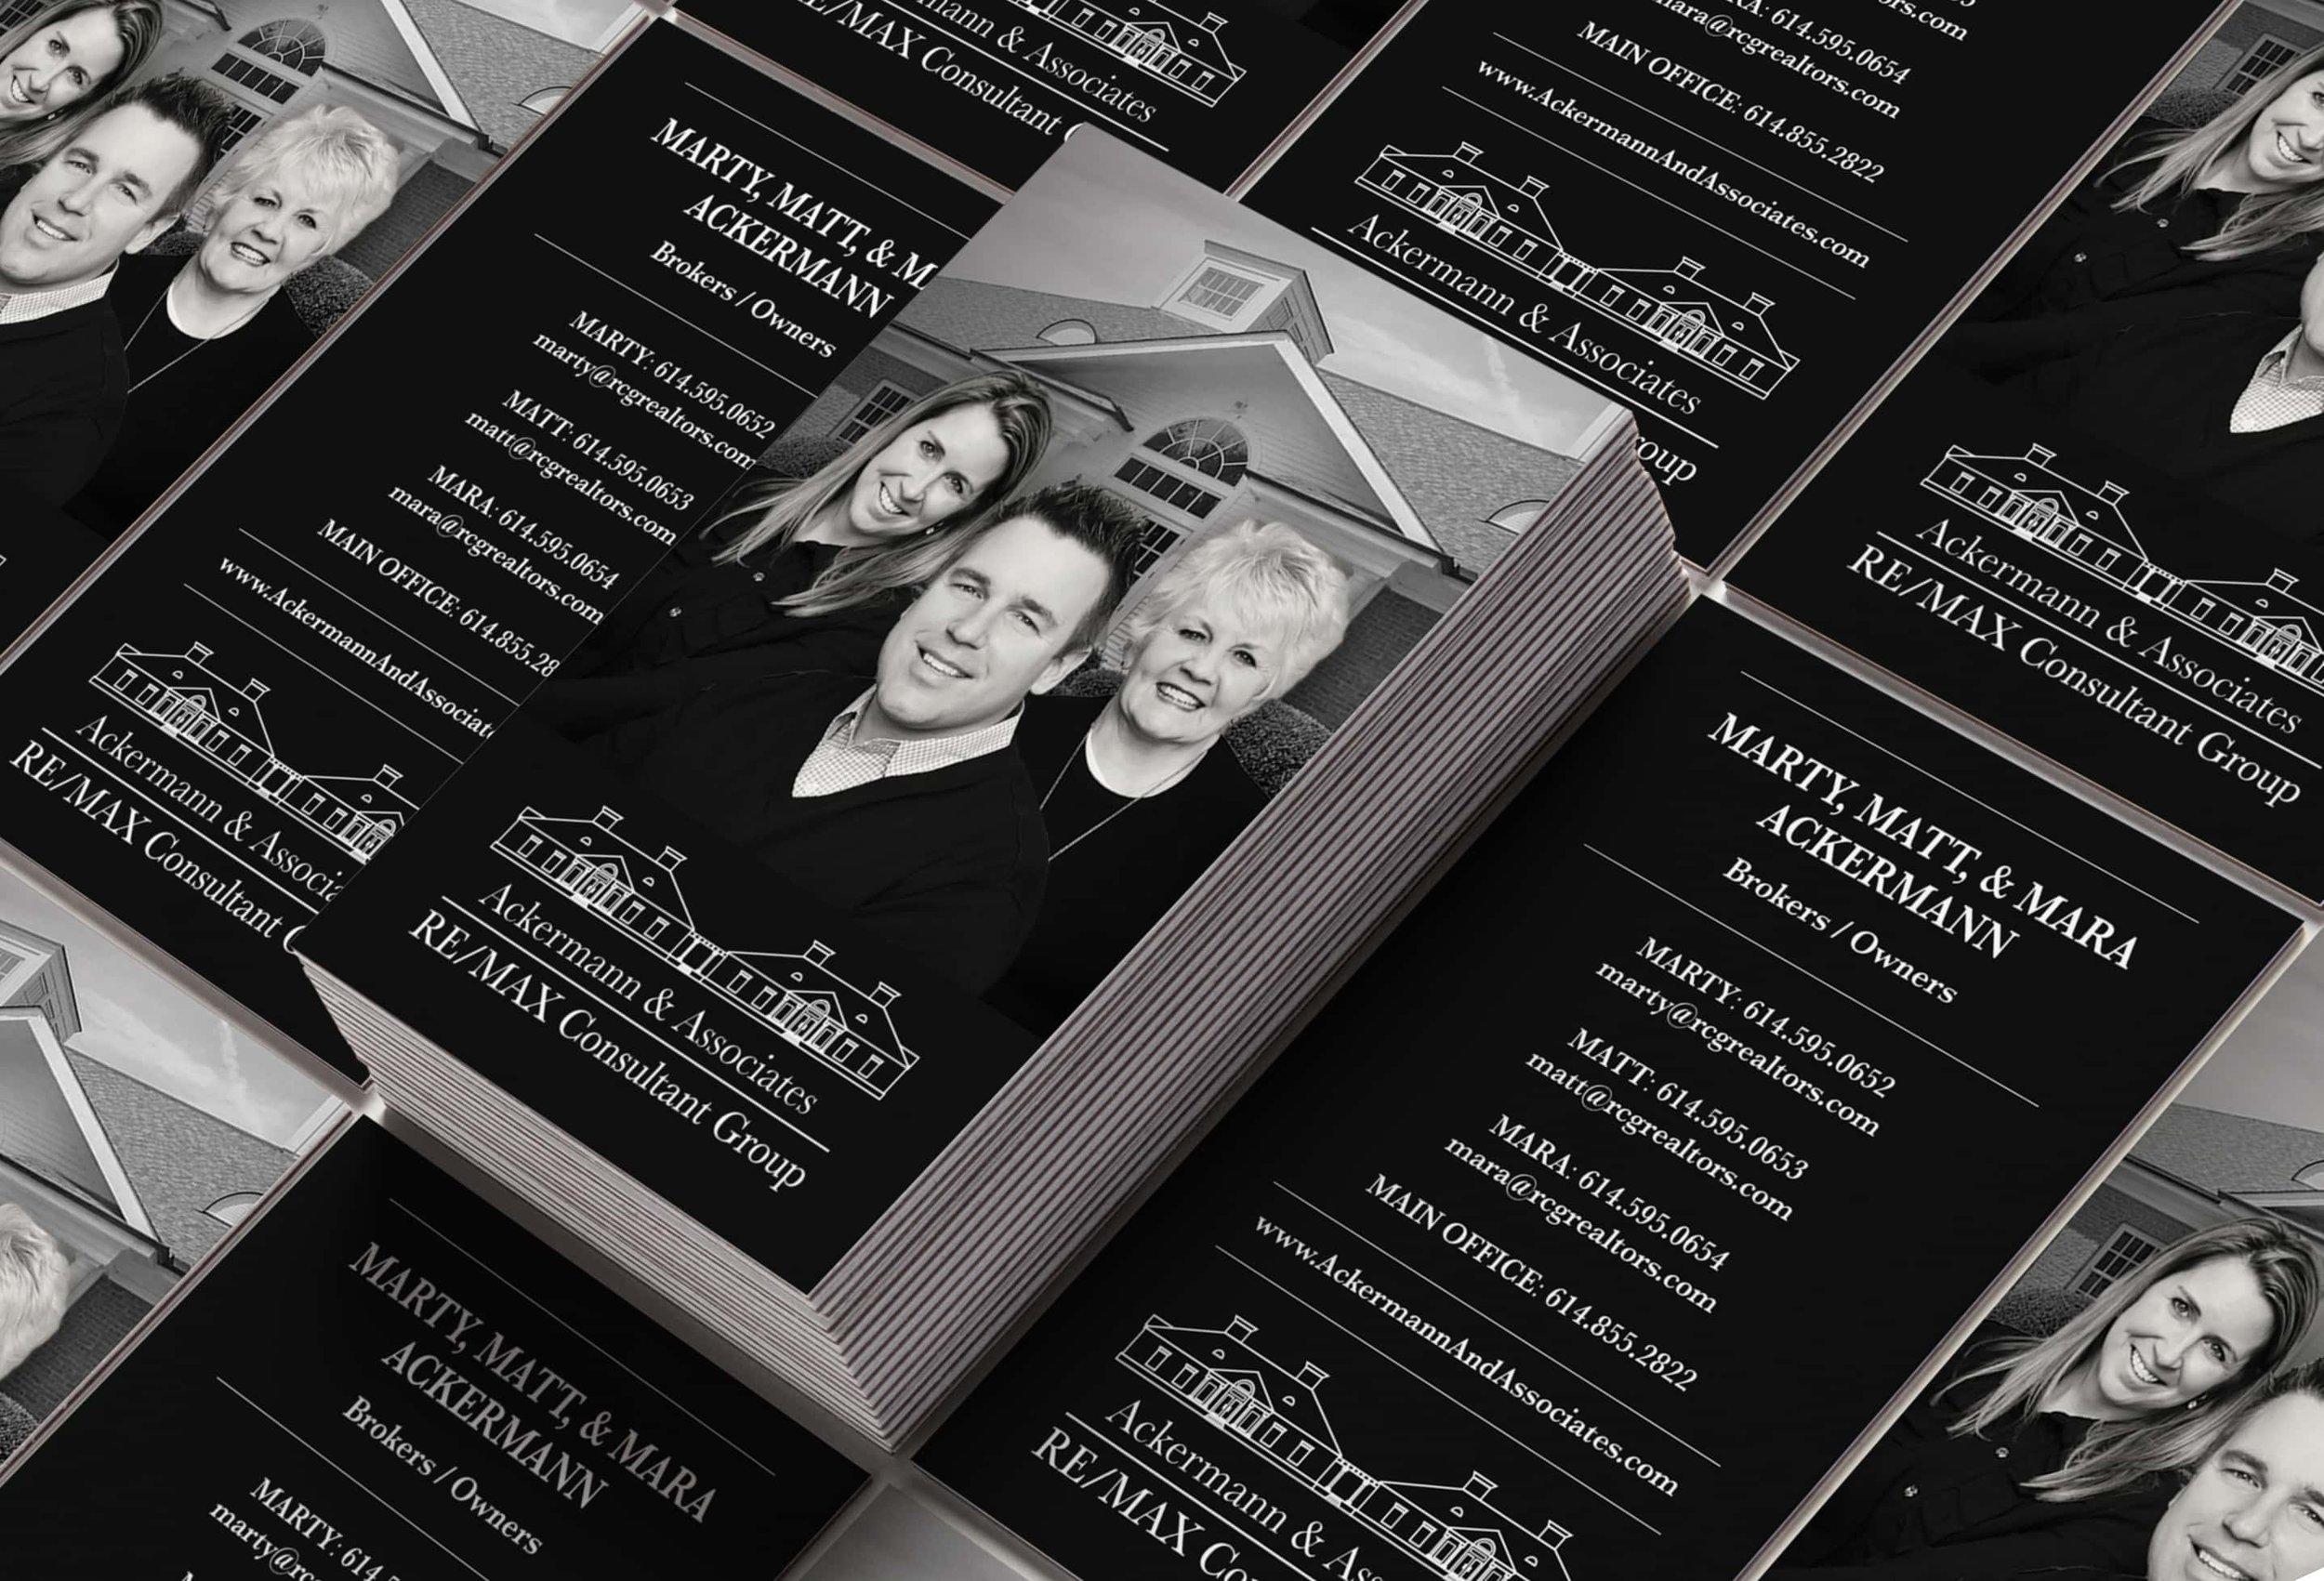 ACKERMANN CARDS copy.jpg